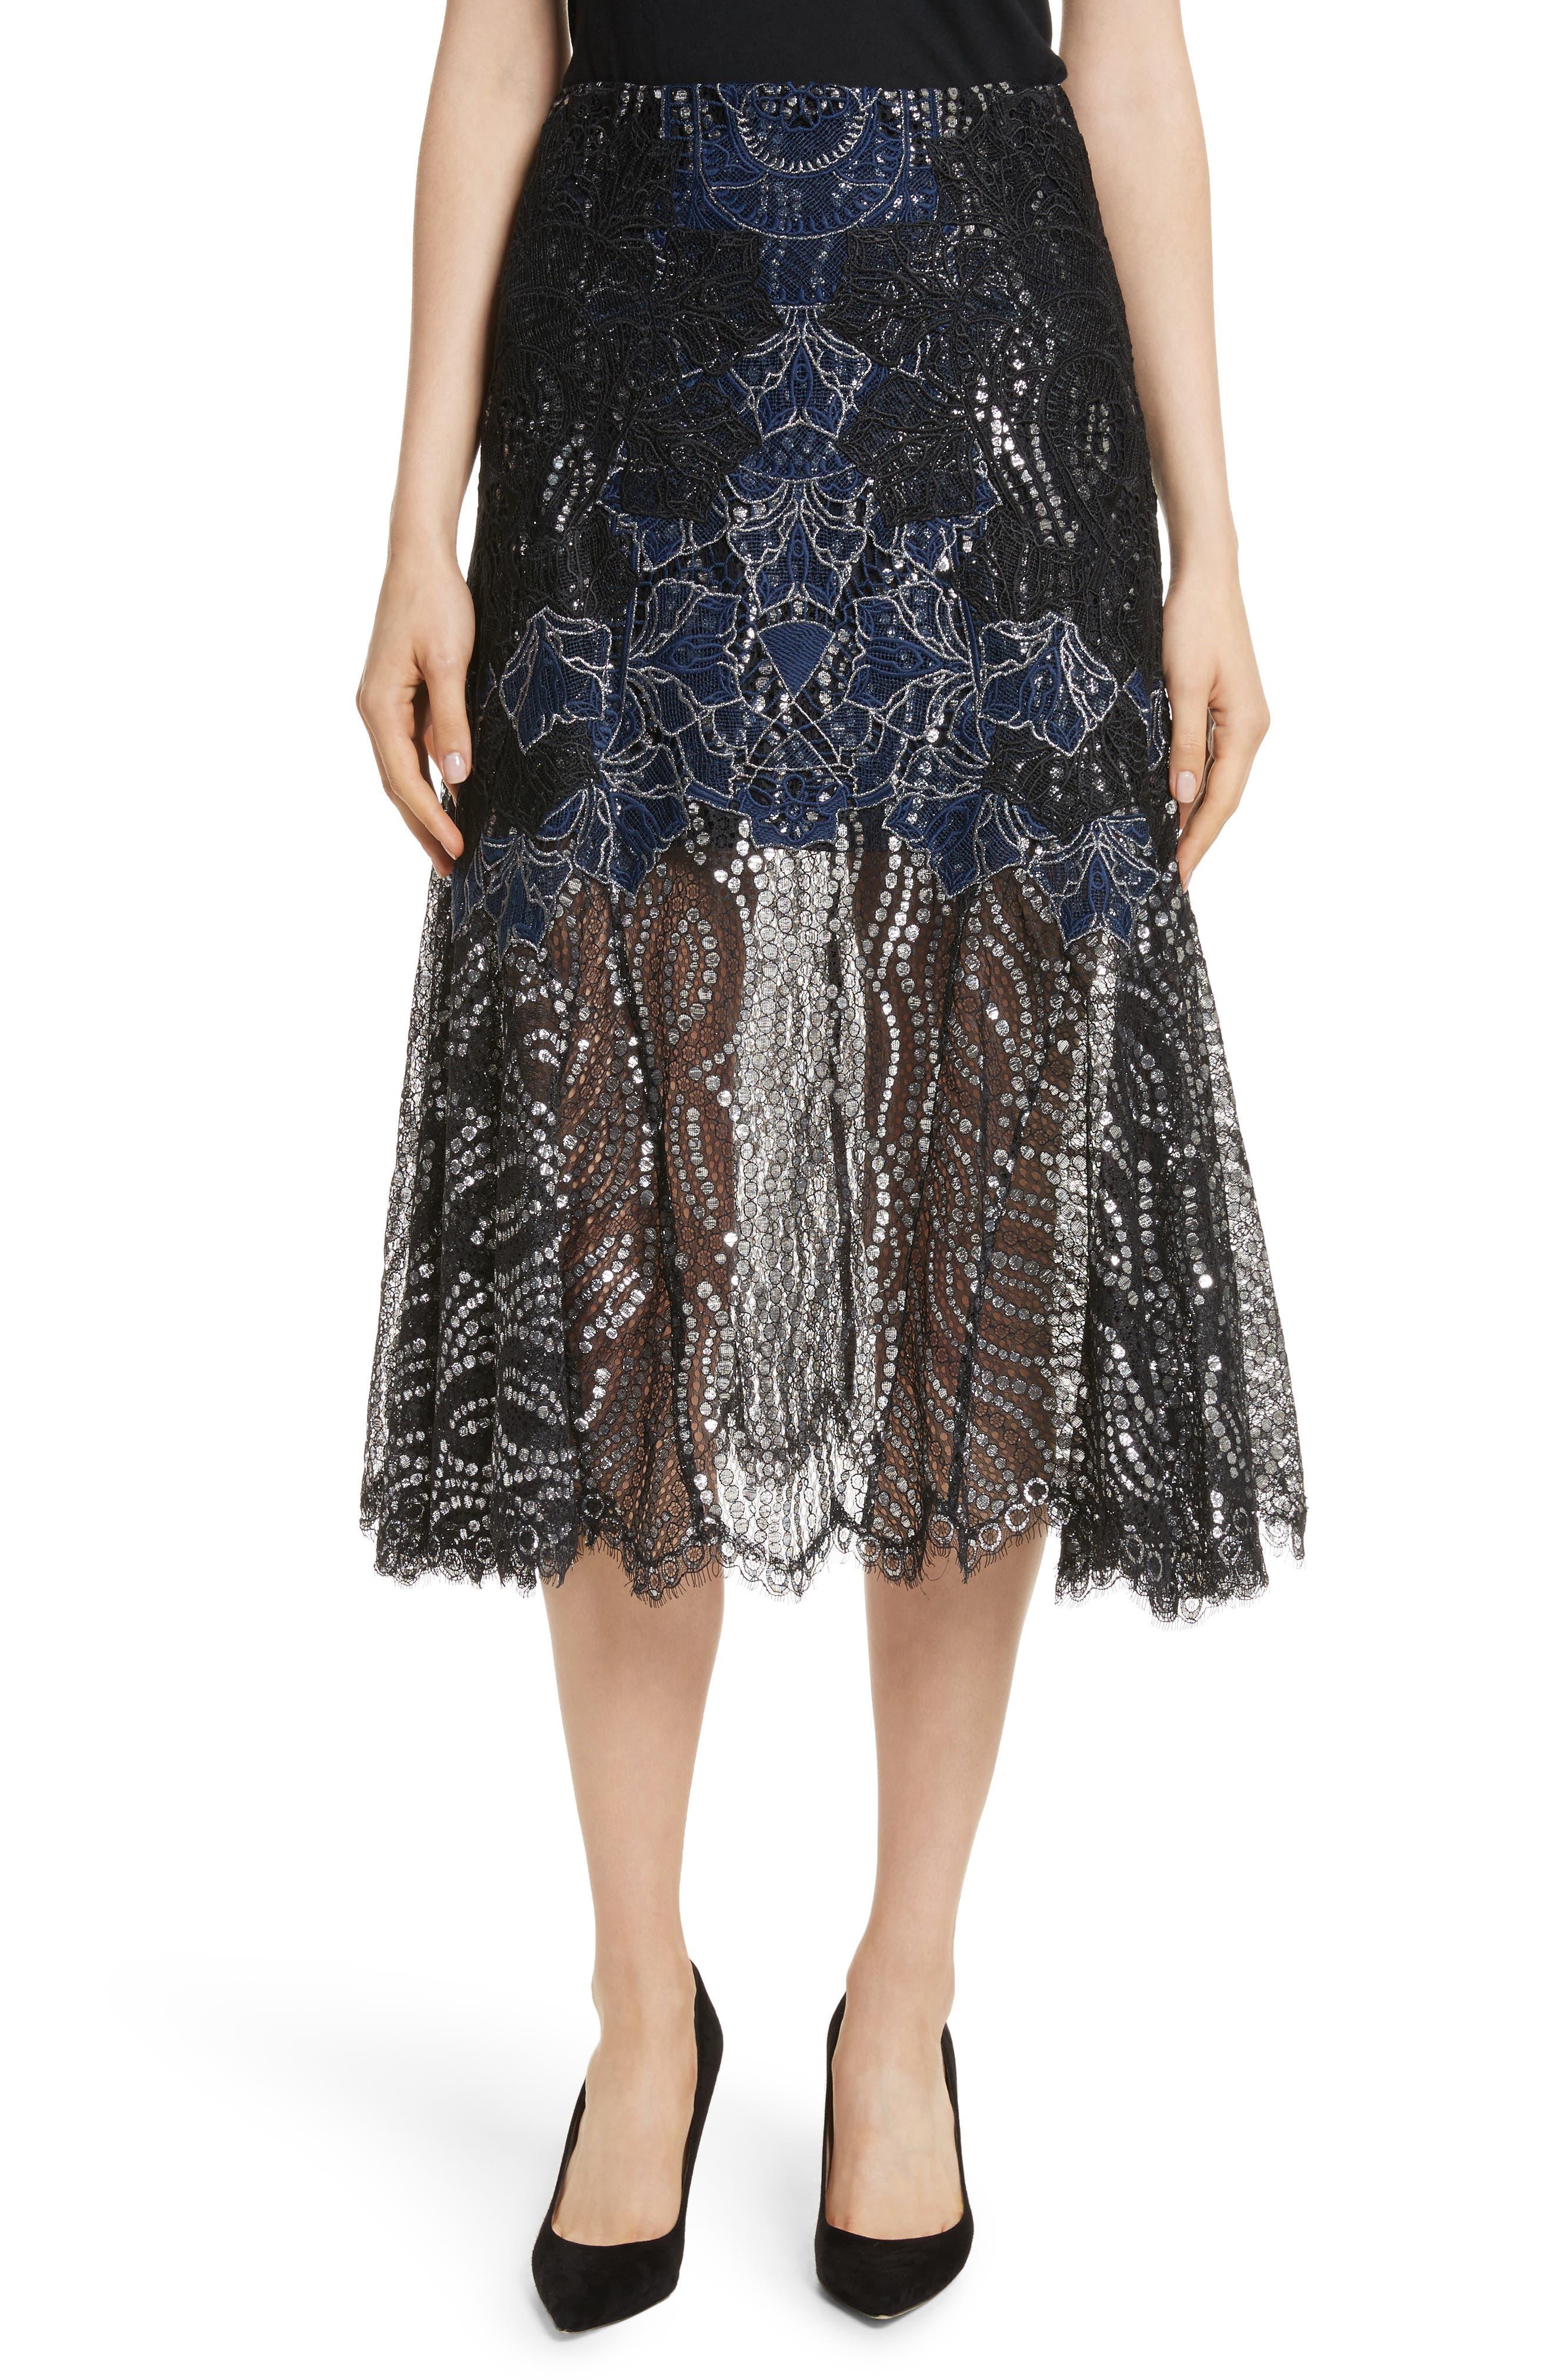 Jonathan Simkhai Dimensional Metallic Appliqué Trumpet Skirt